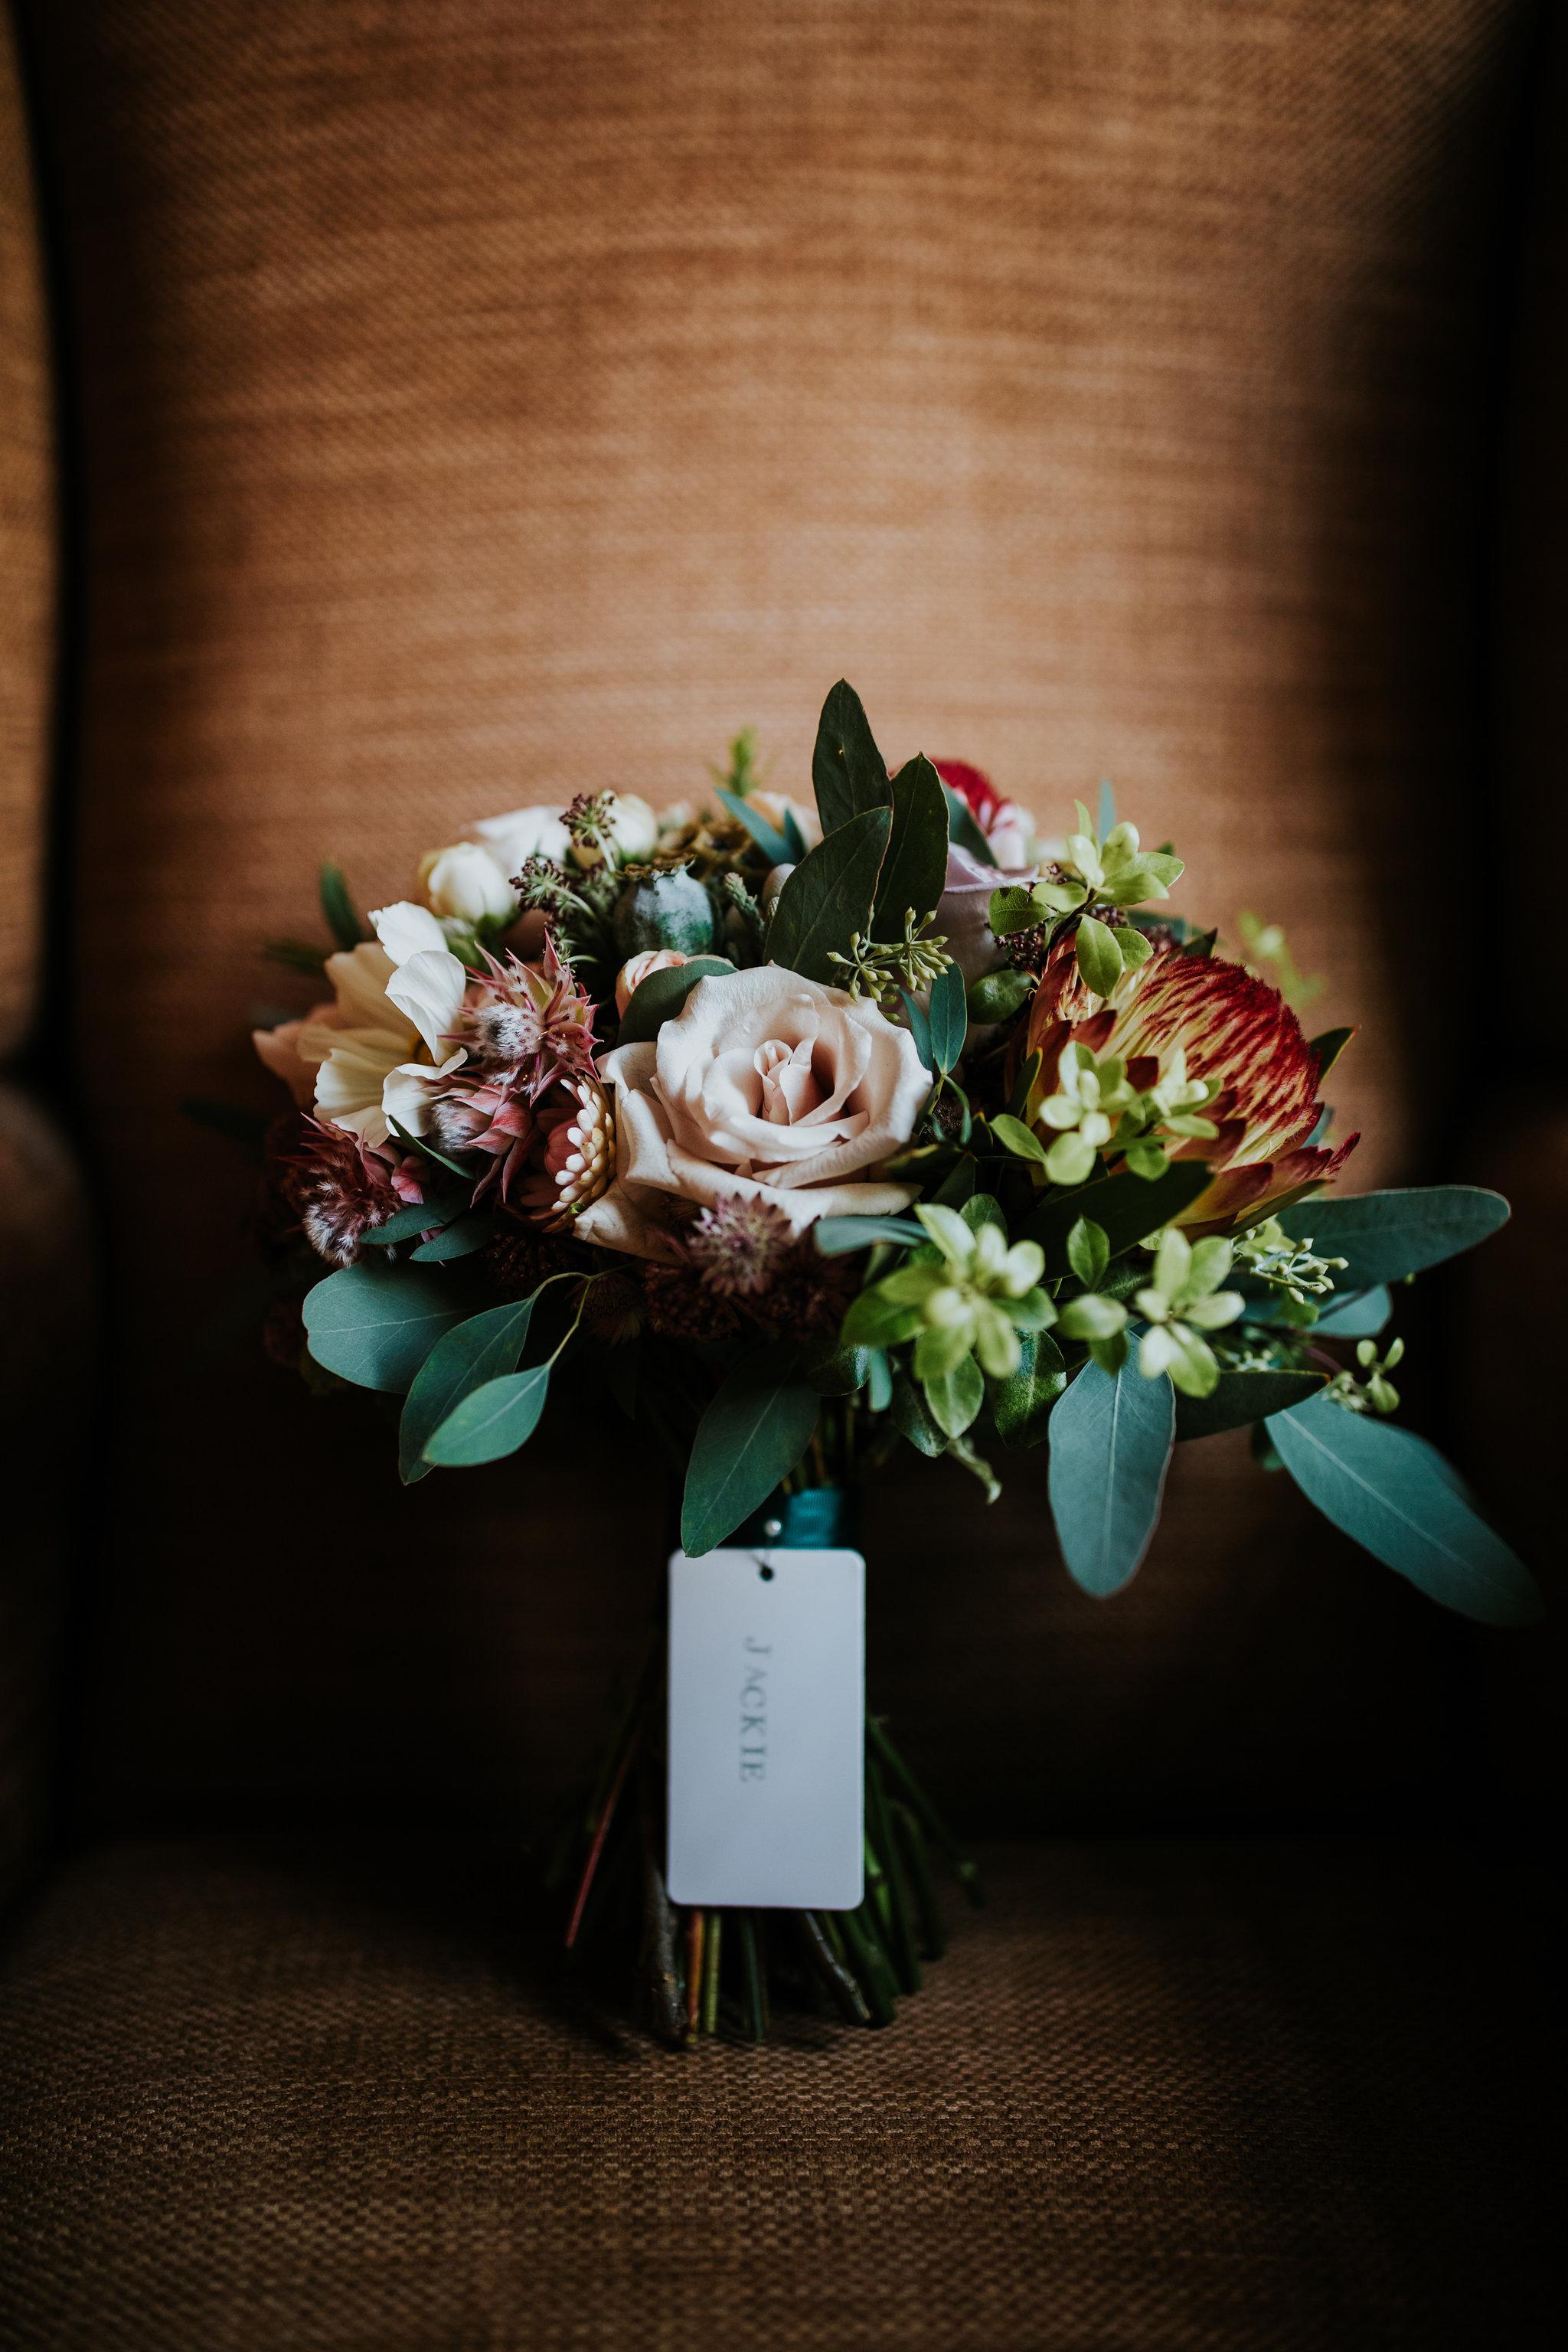 Cottiers wedding lavender and rose wedding florists scotland1.jpg